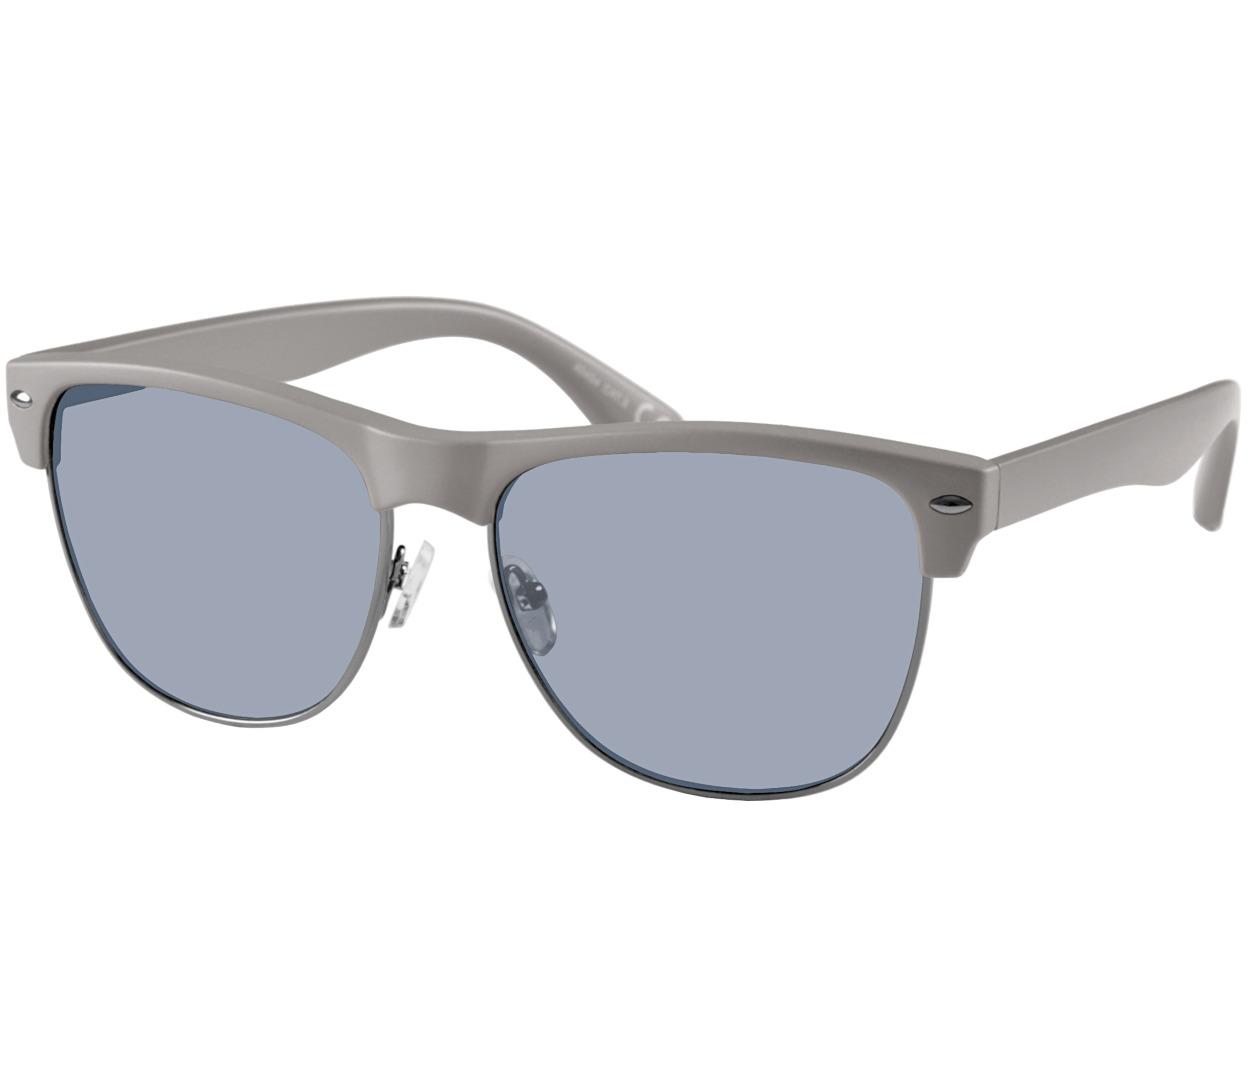 Main Image (Angle) - Horizon (Grey) Retro Sunglasses